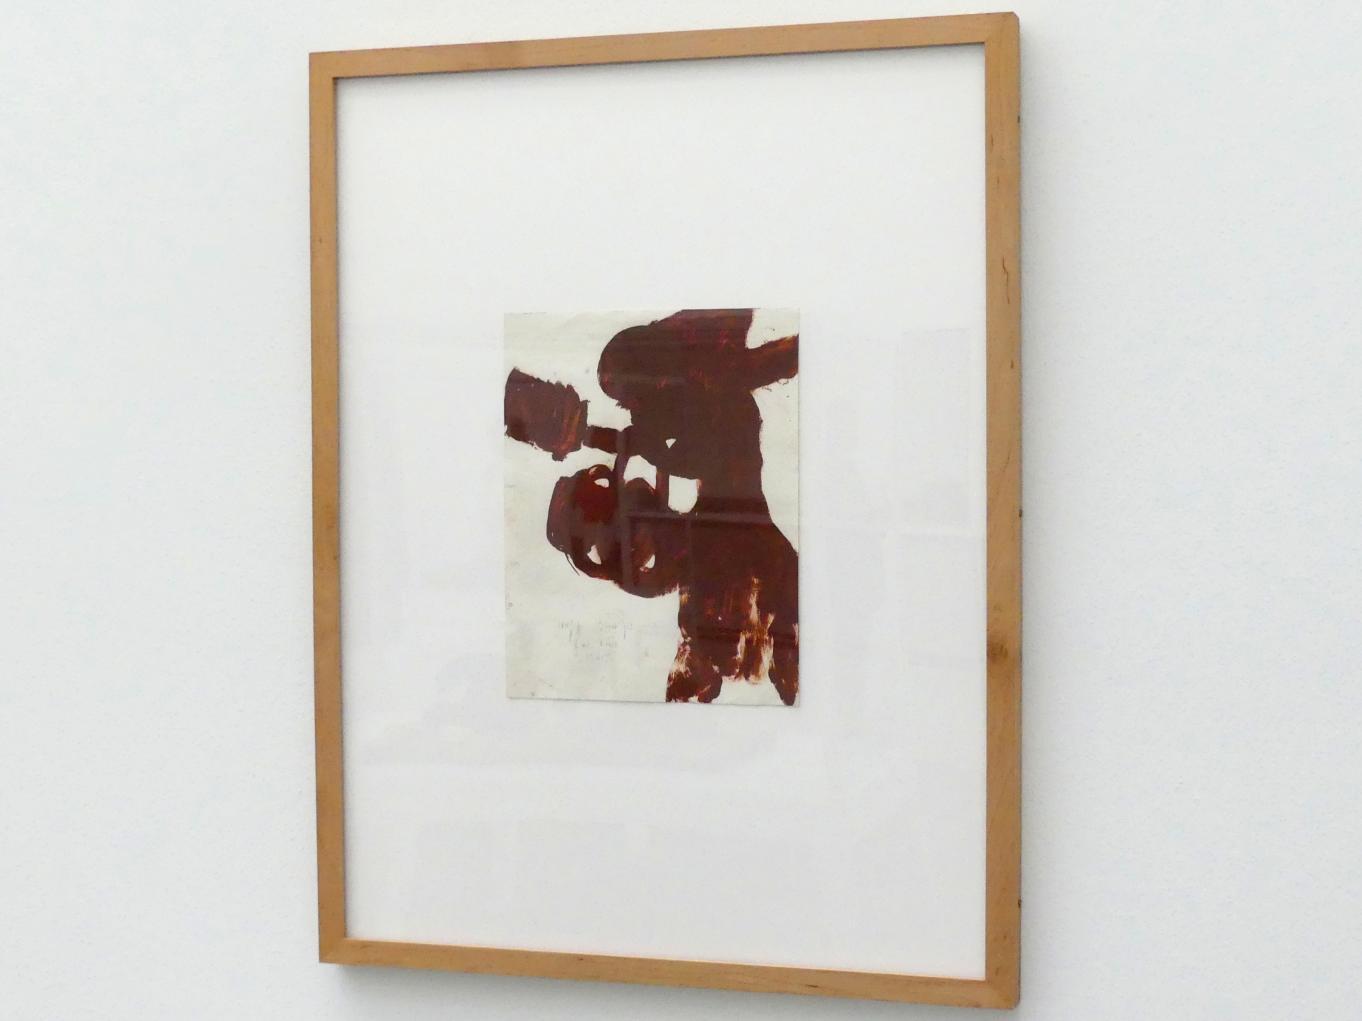 Joseph Beuys: Foetus, 1961